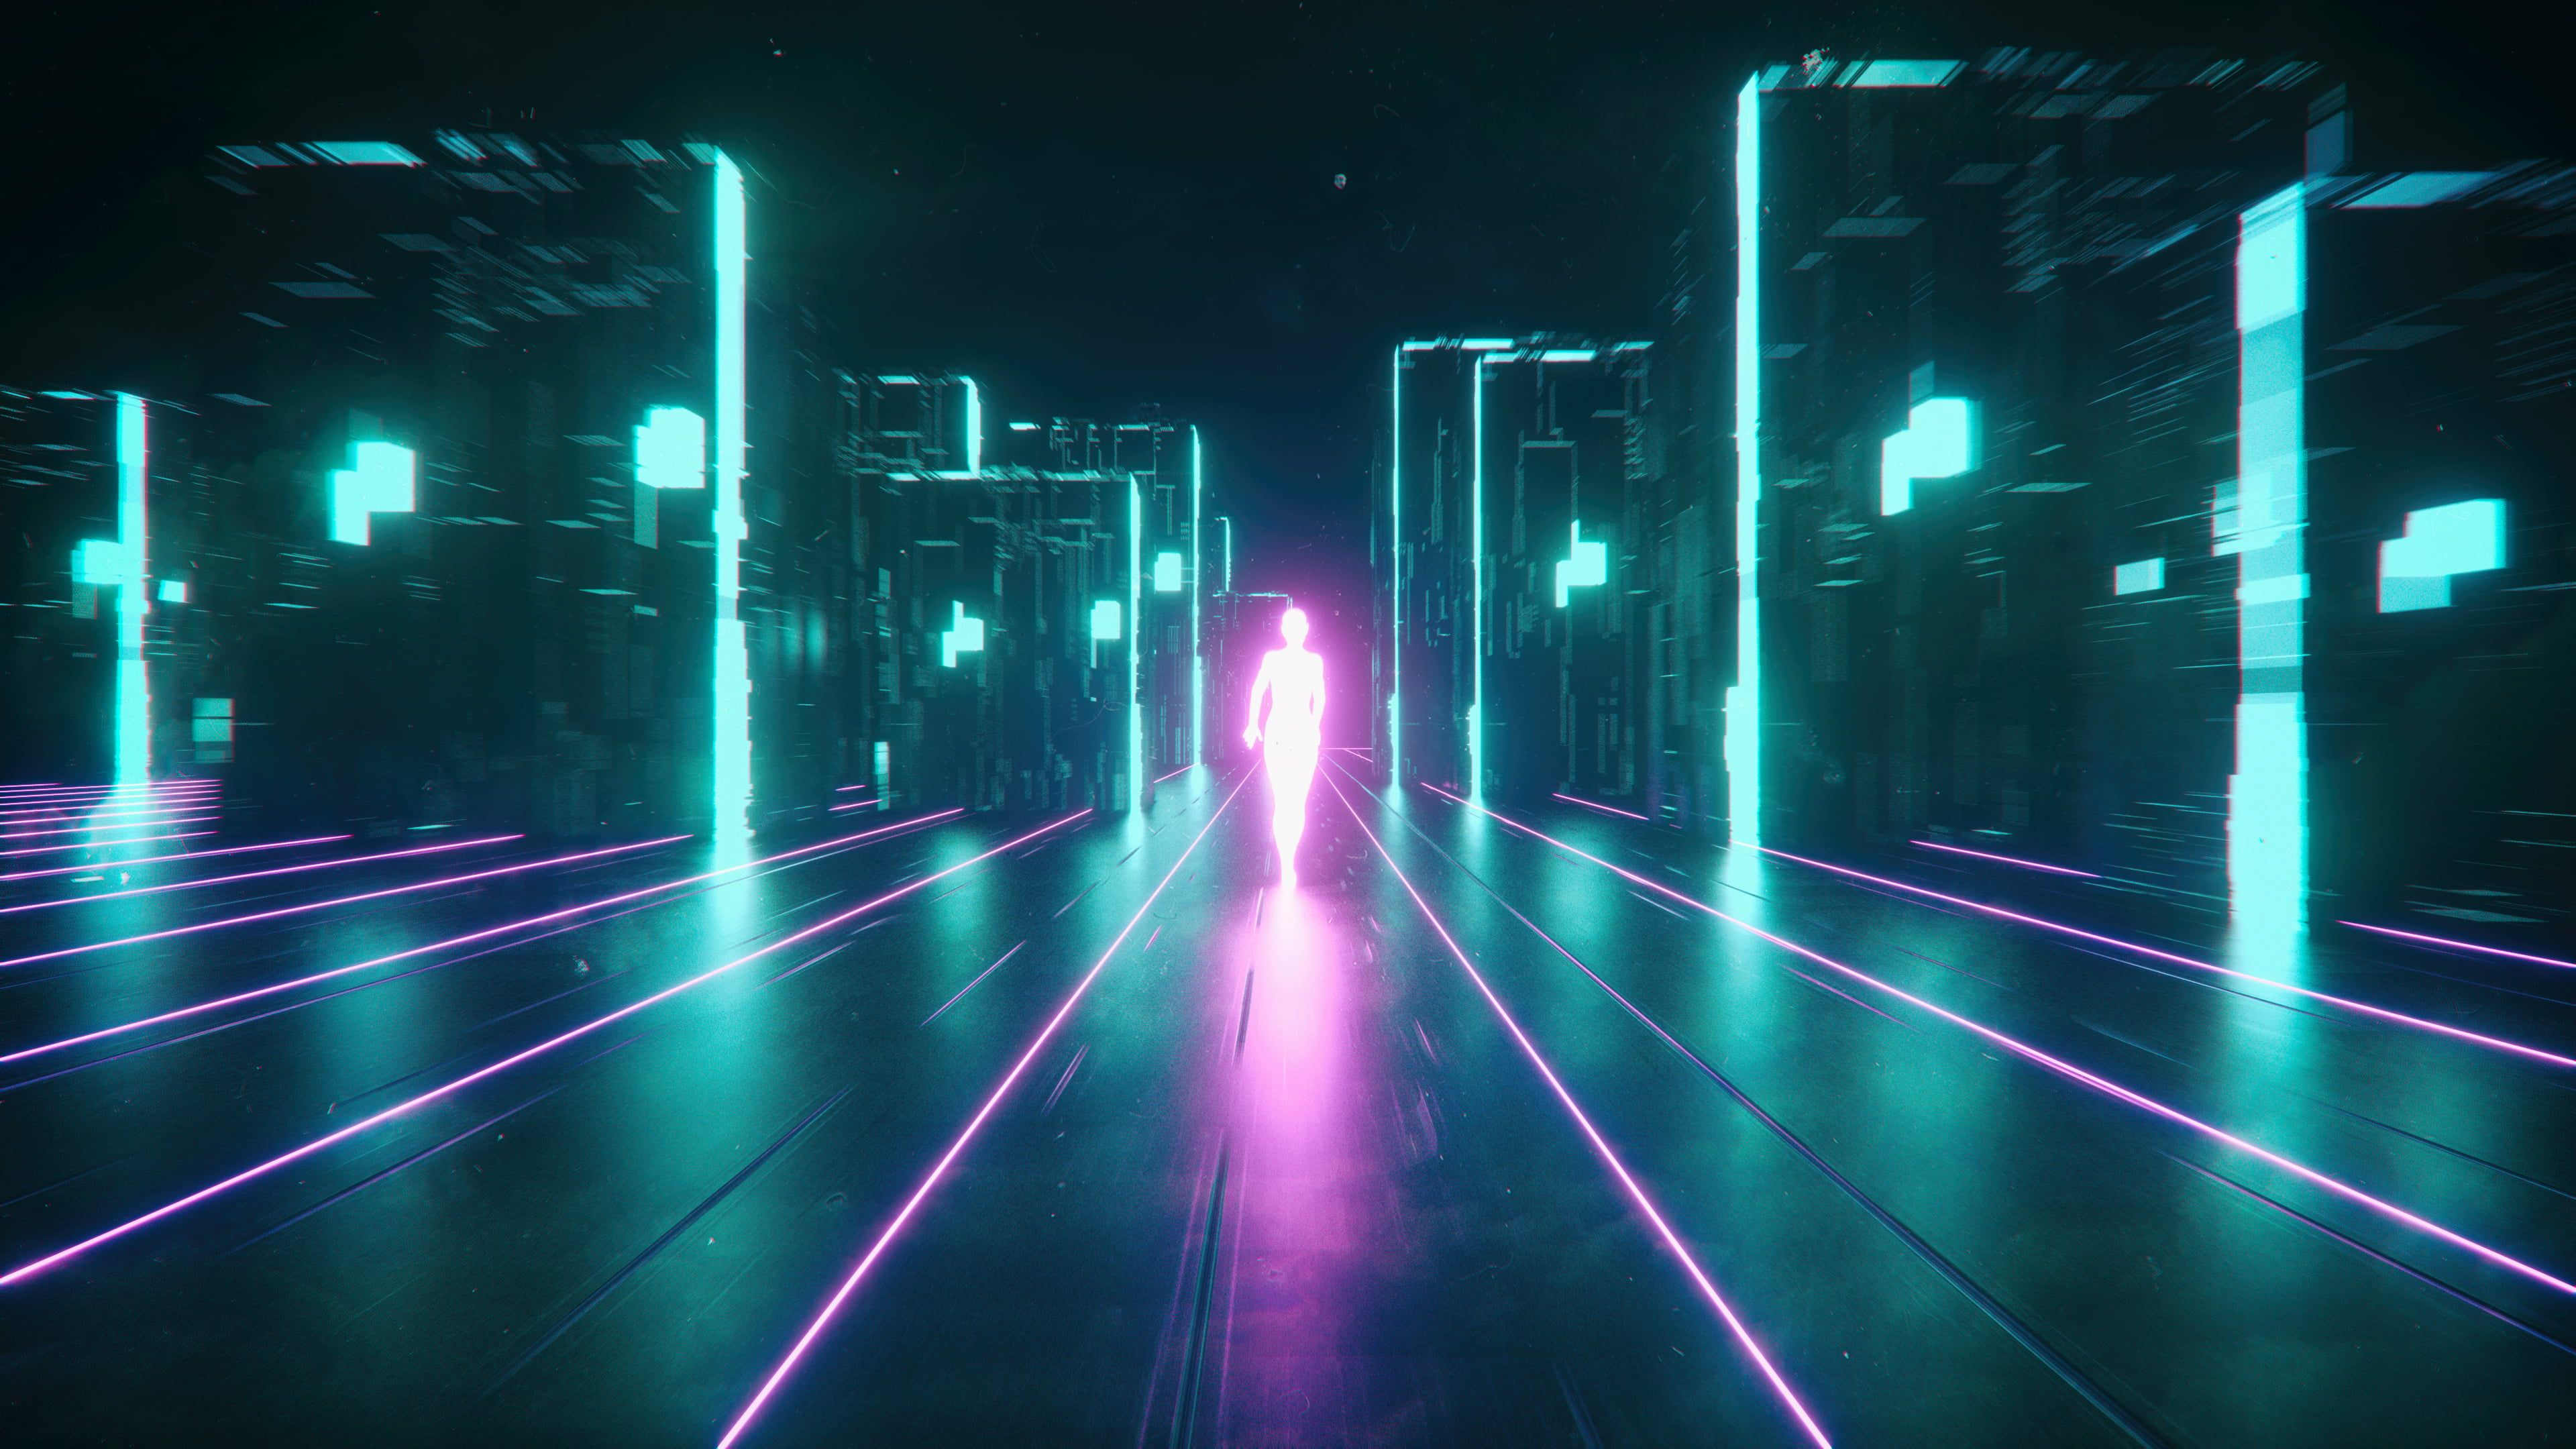 Pink And Teal Digital Wallpaper Neon Cyberpunk 4k Wallpaper Hdwallpaper Desktop In 2020 Digital Wallpaper Hd Wallpaper Robot Wallpaper